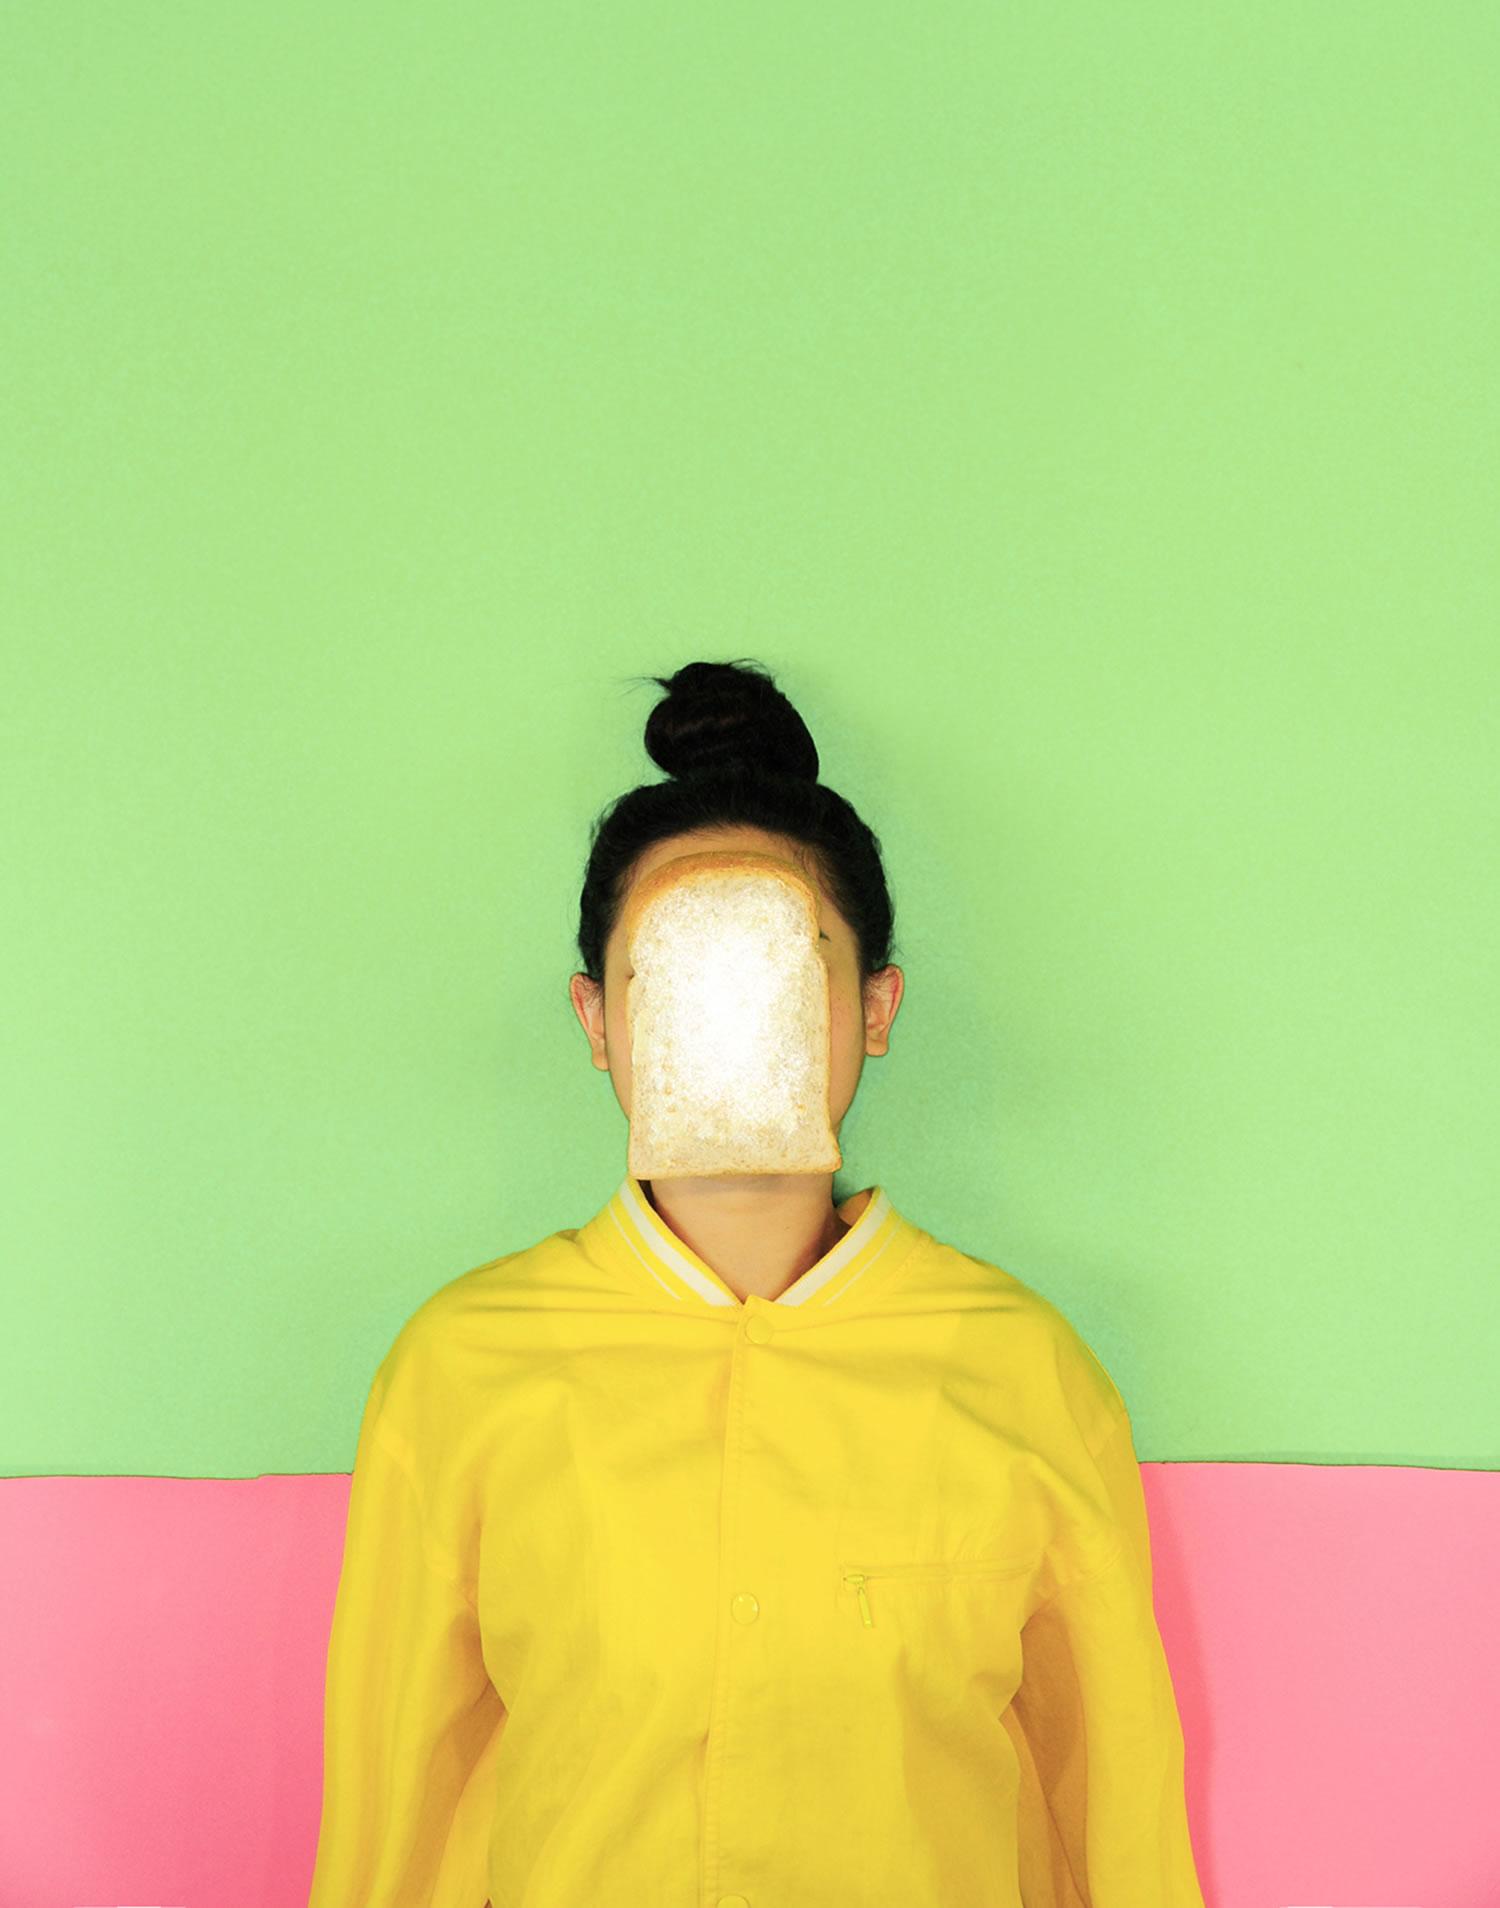 fotografi-ispirazione-rene-magritte-fotografia-arte-07